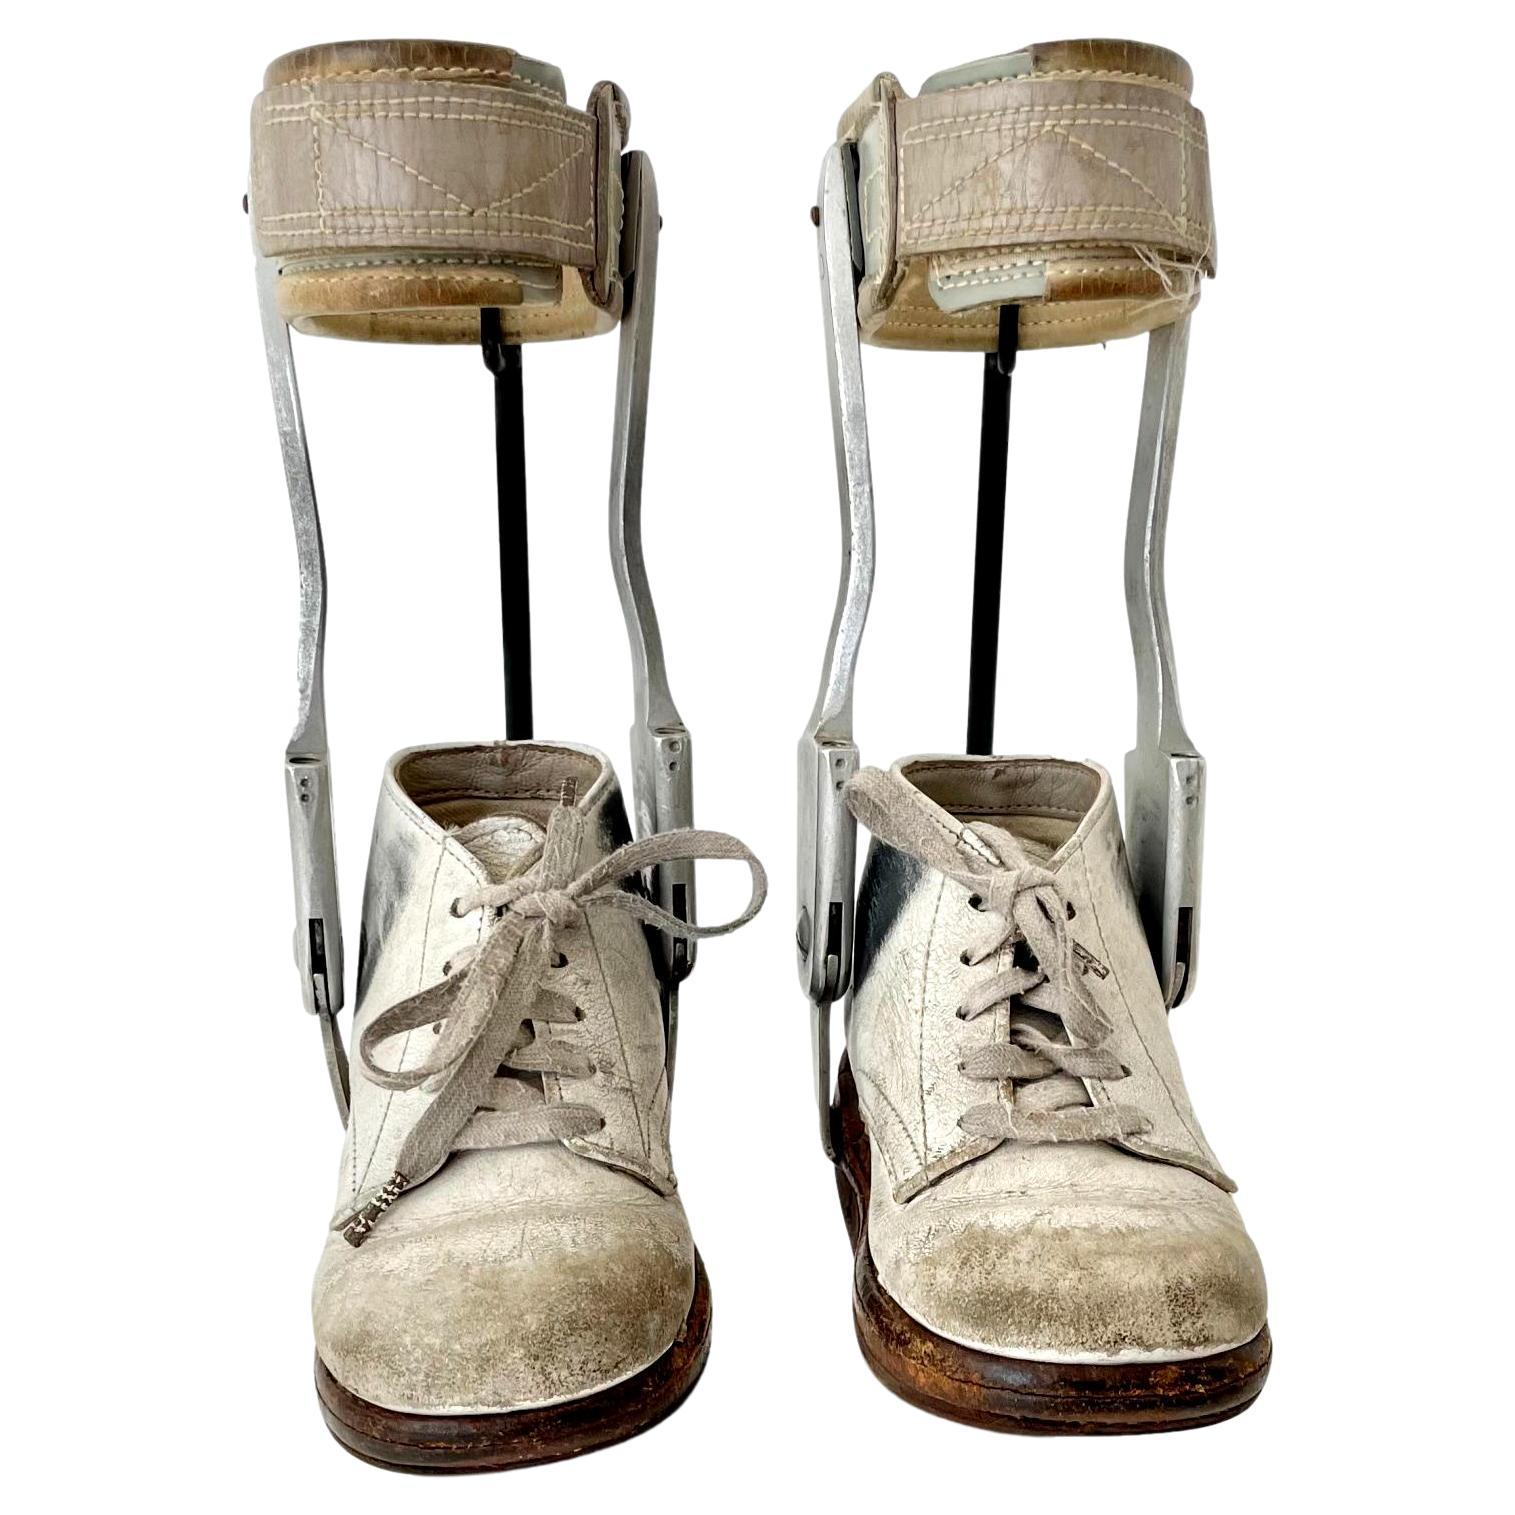 1940's Children's Leg Braces